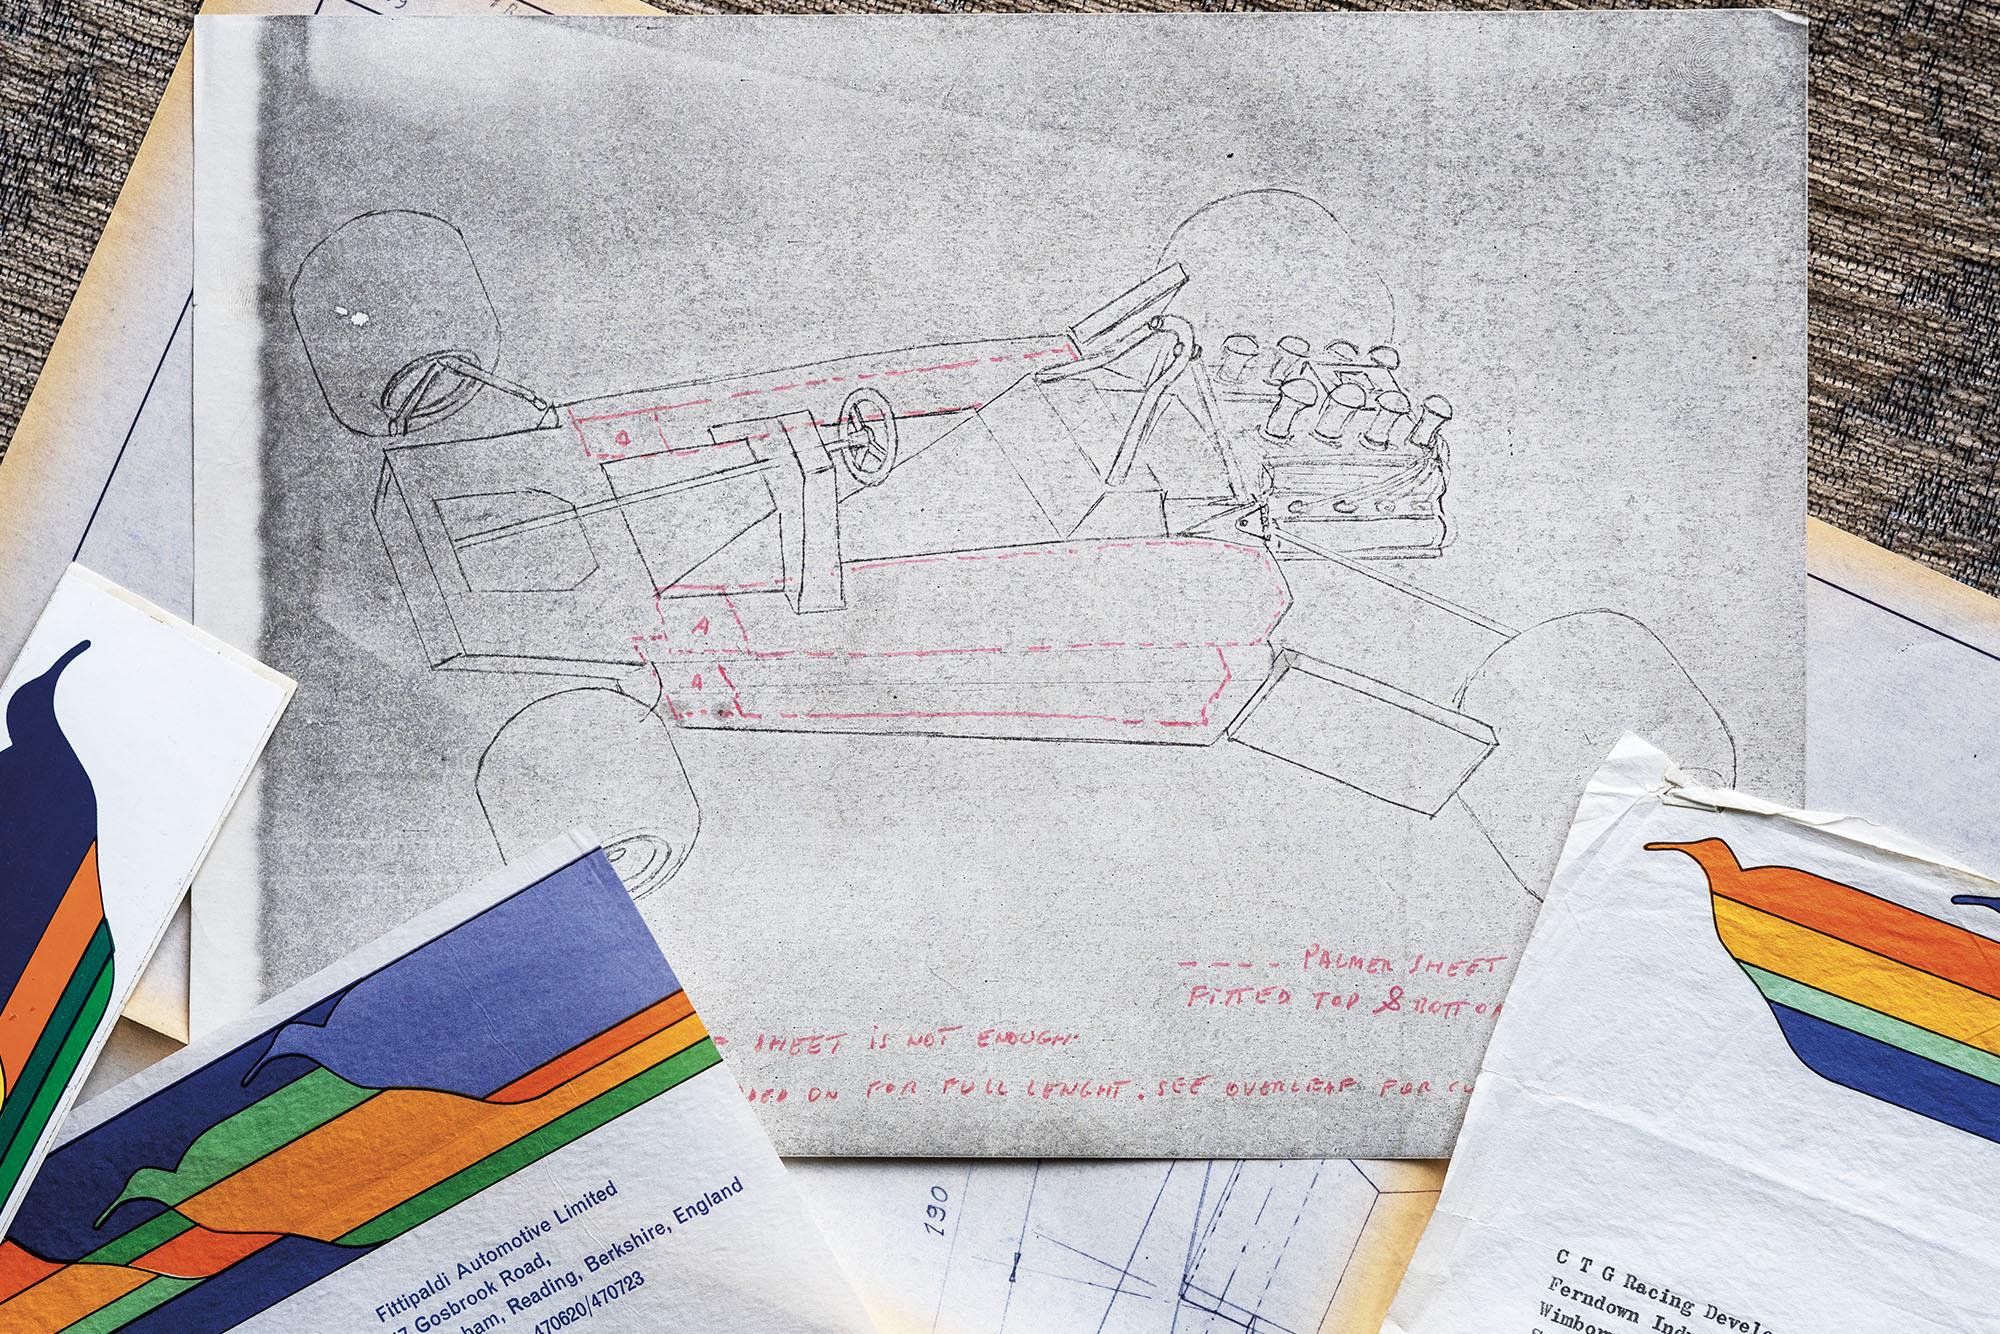 Fittipaldi CTG details